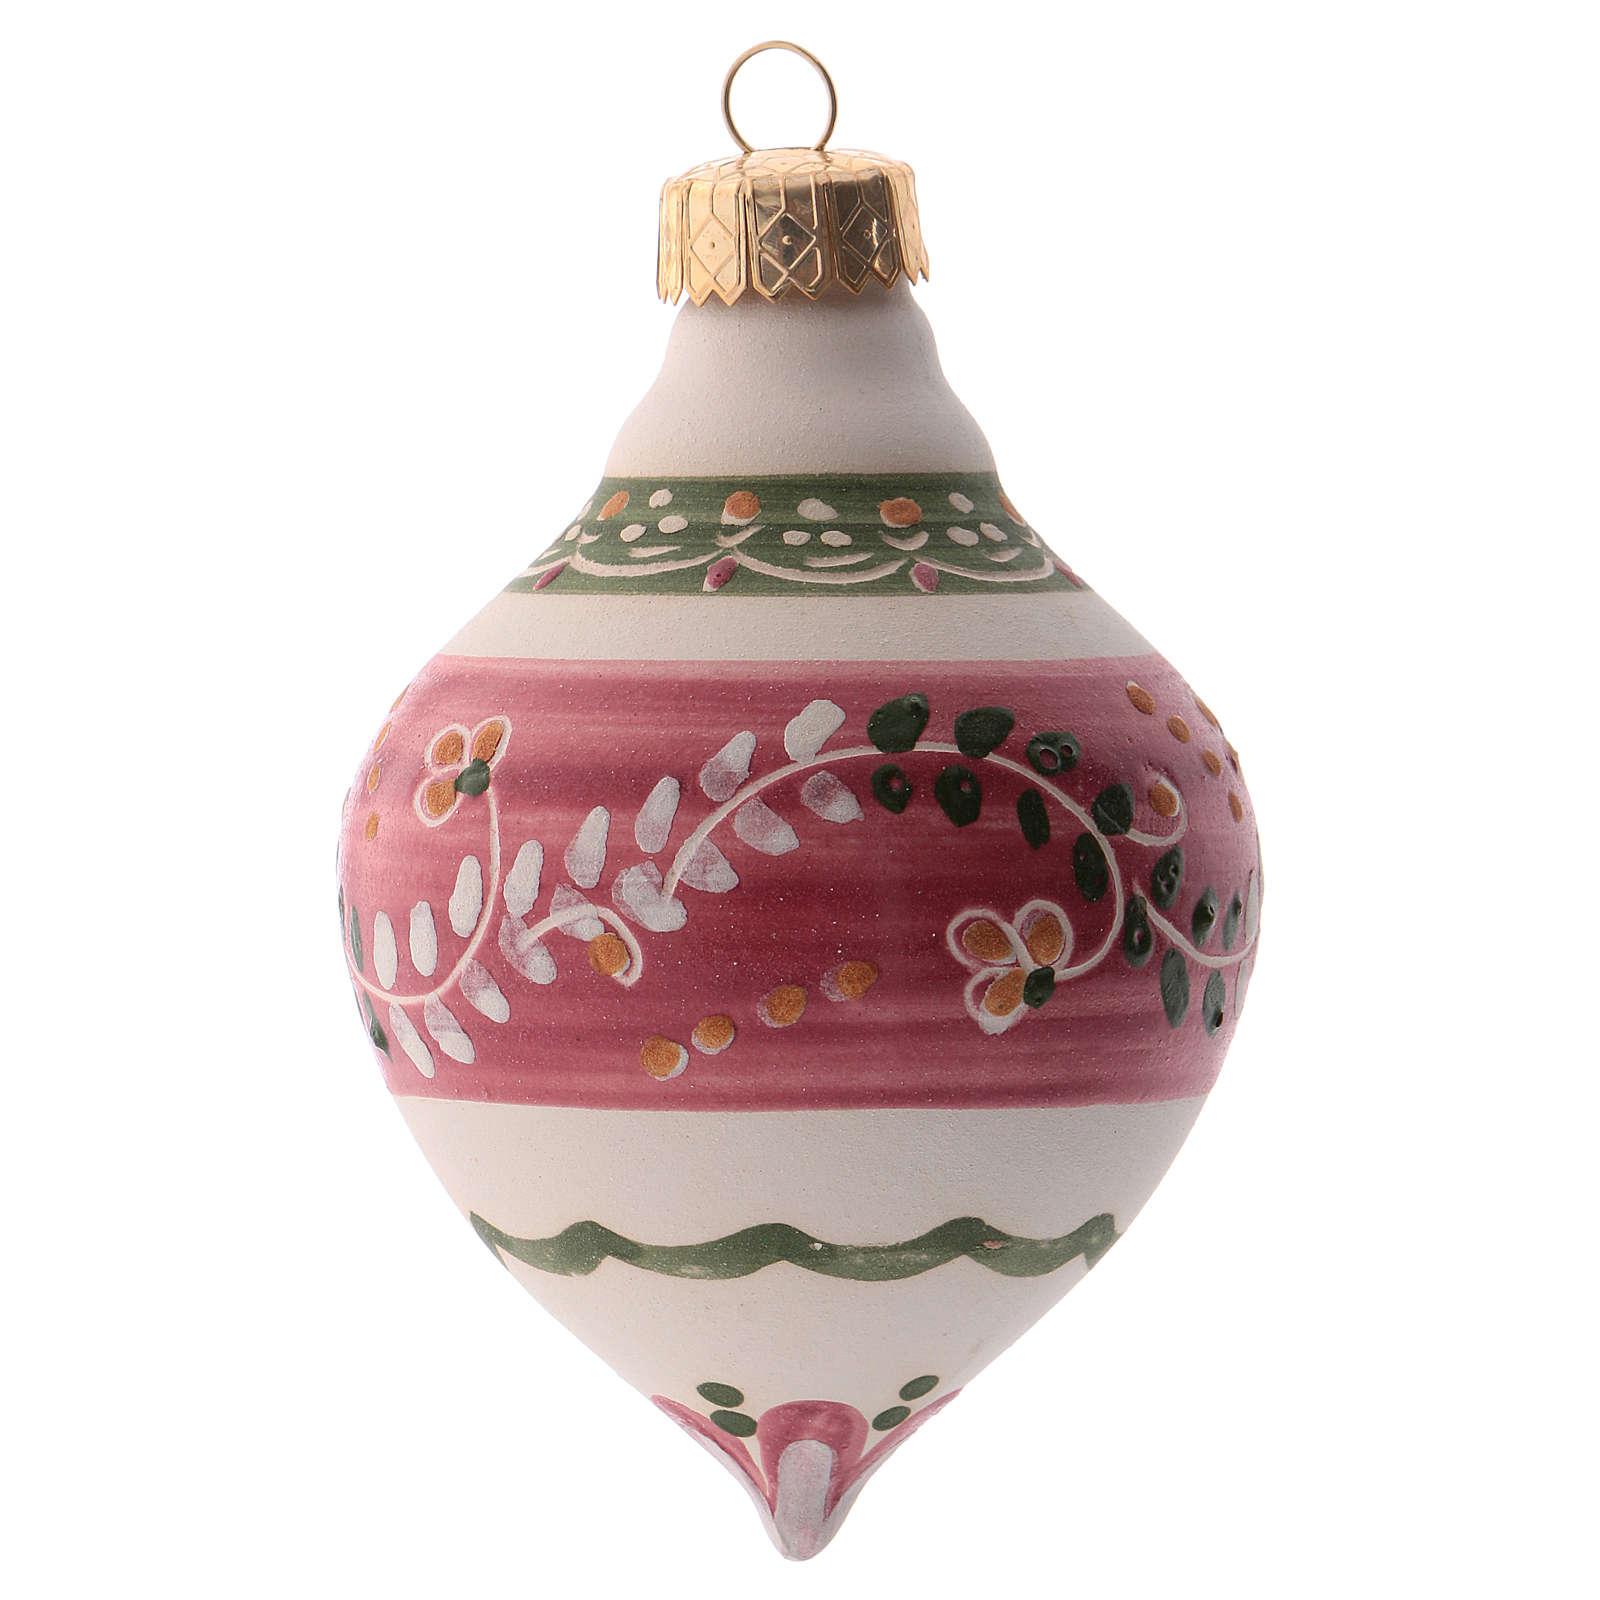 Pallina per albero Natale rosa 100 mm in ceramica Deruta 4